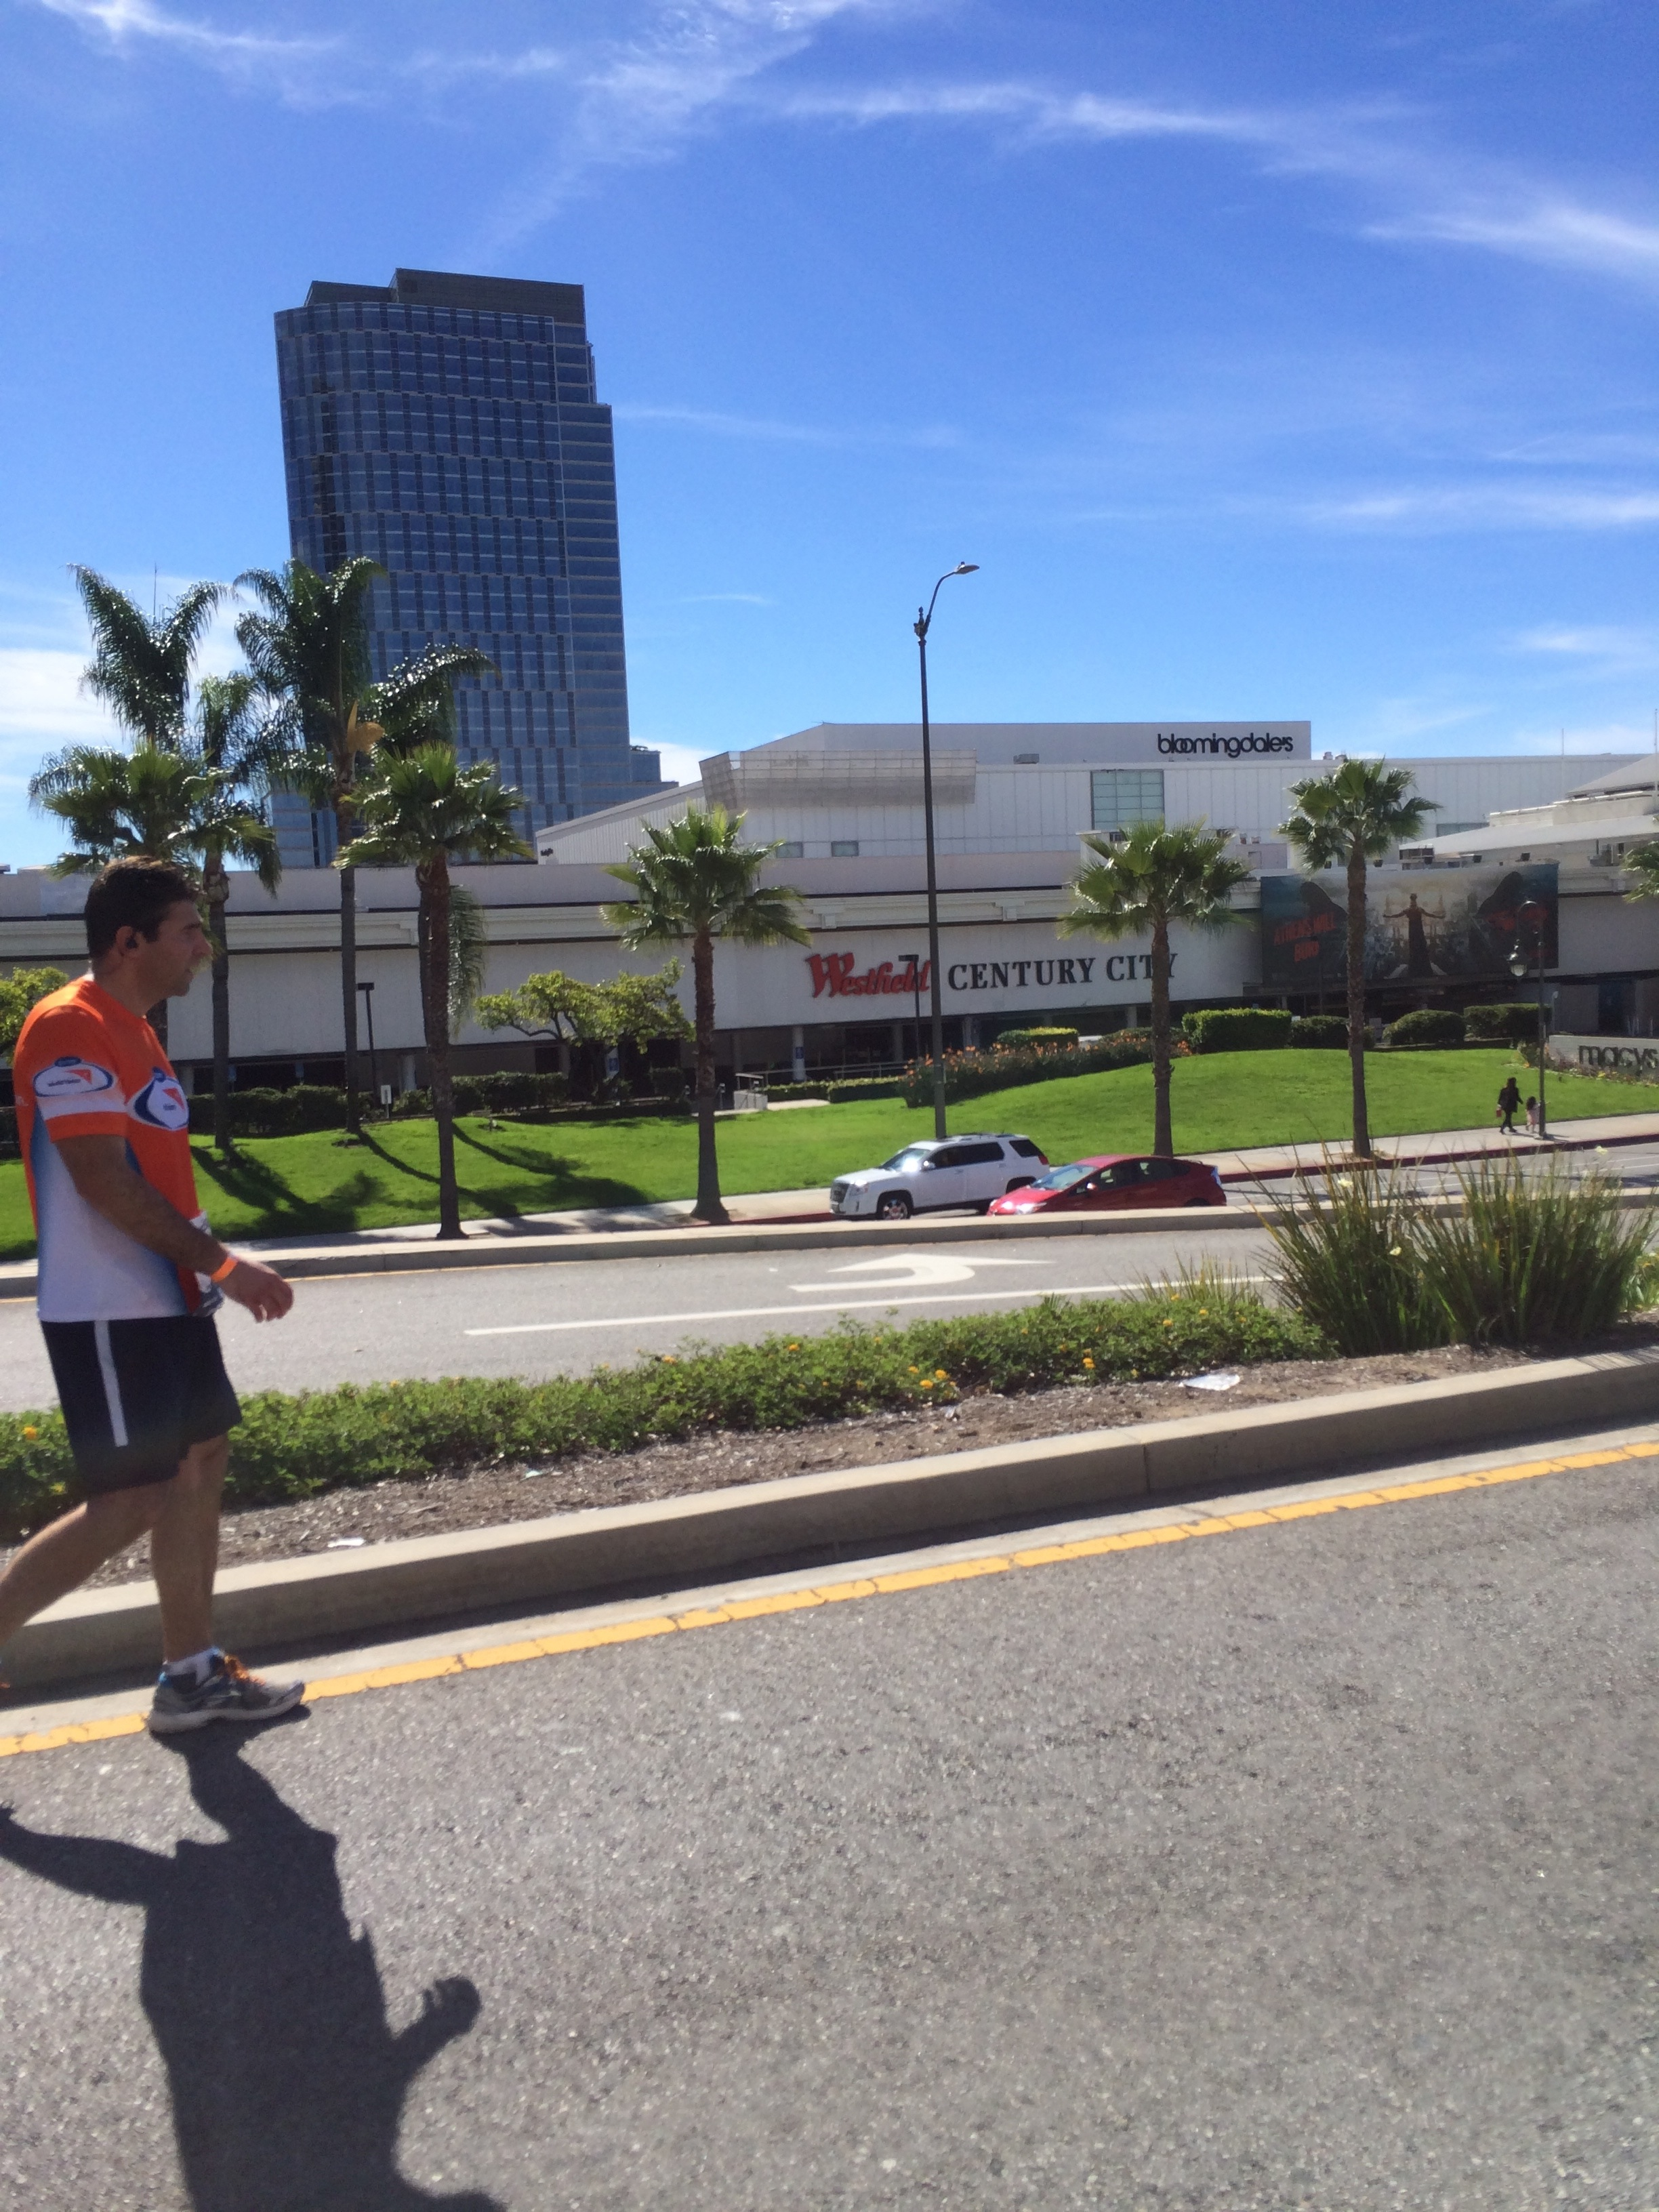 LA-Marathon-Century-City